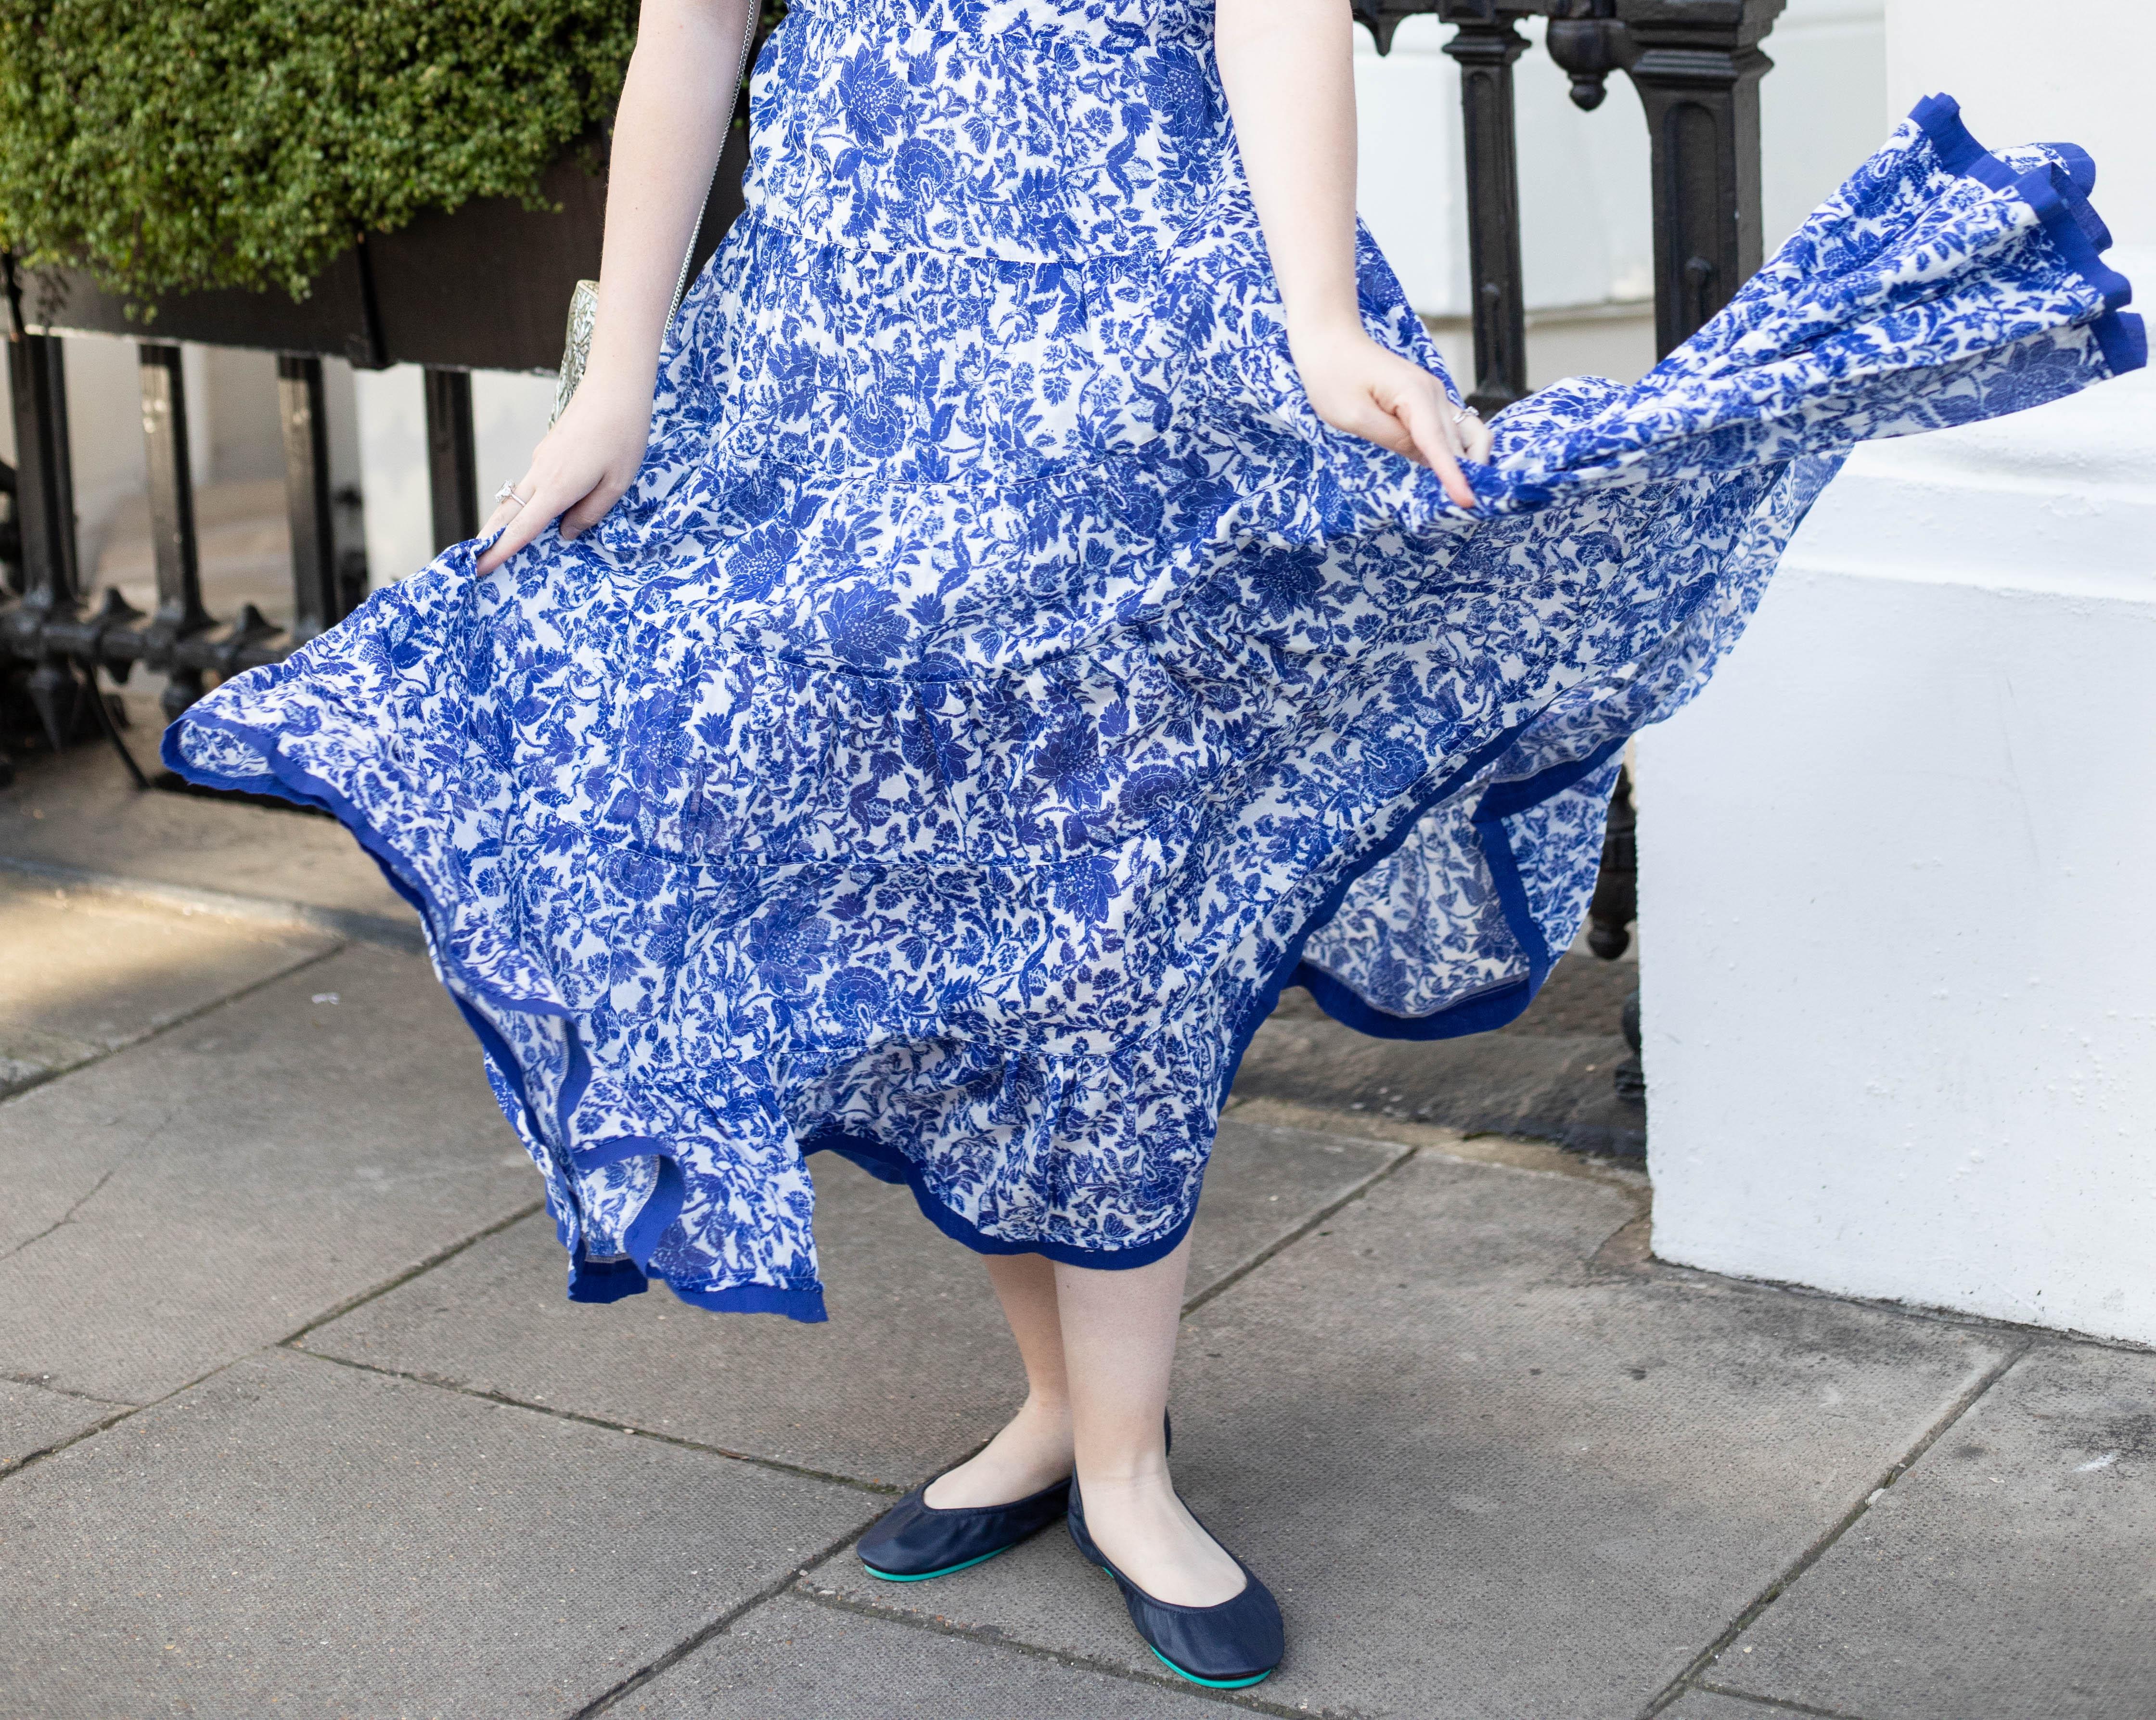 Blue and White Free People Dress California Navy Tieks Silver From St Xavier Handbag at London's Kensington Hotel